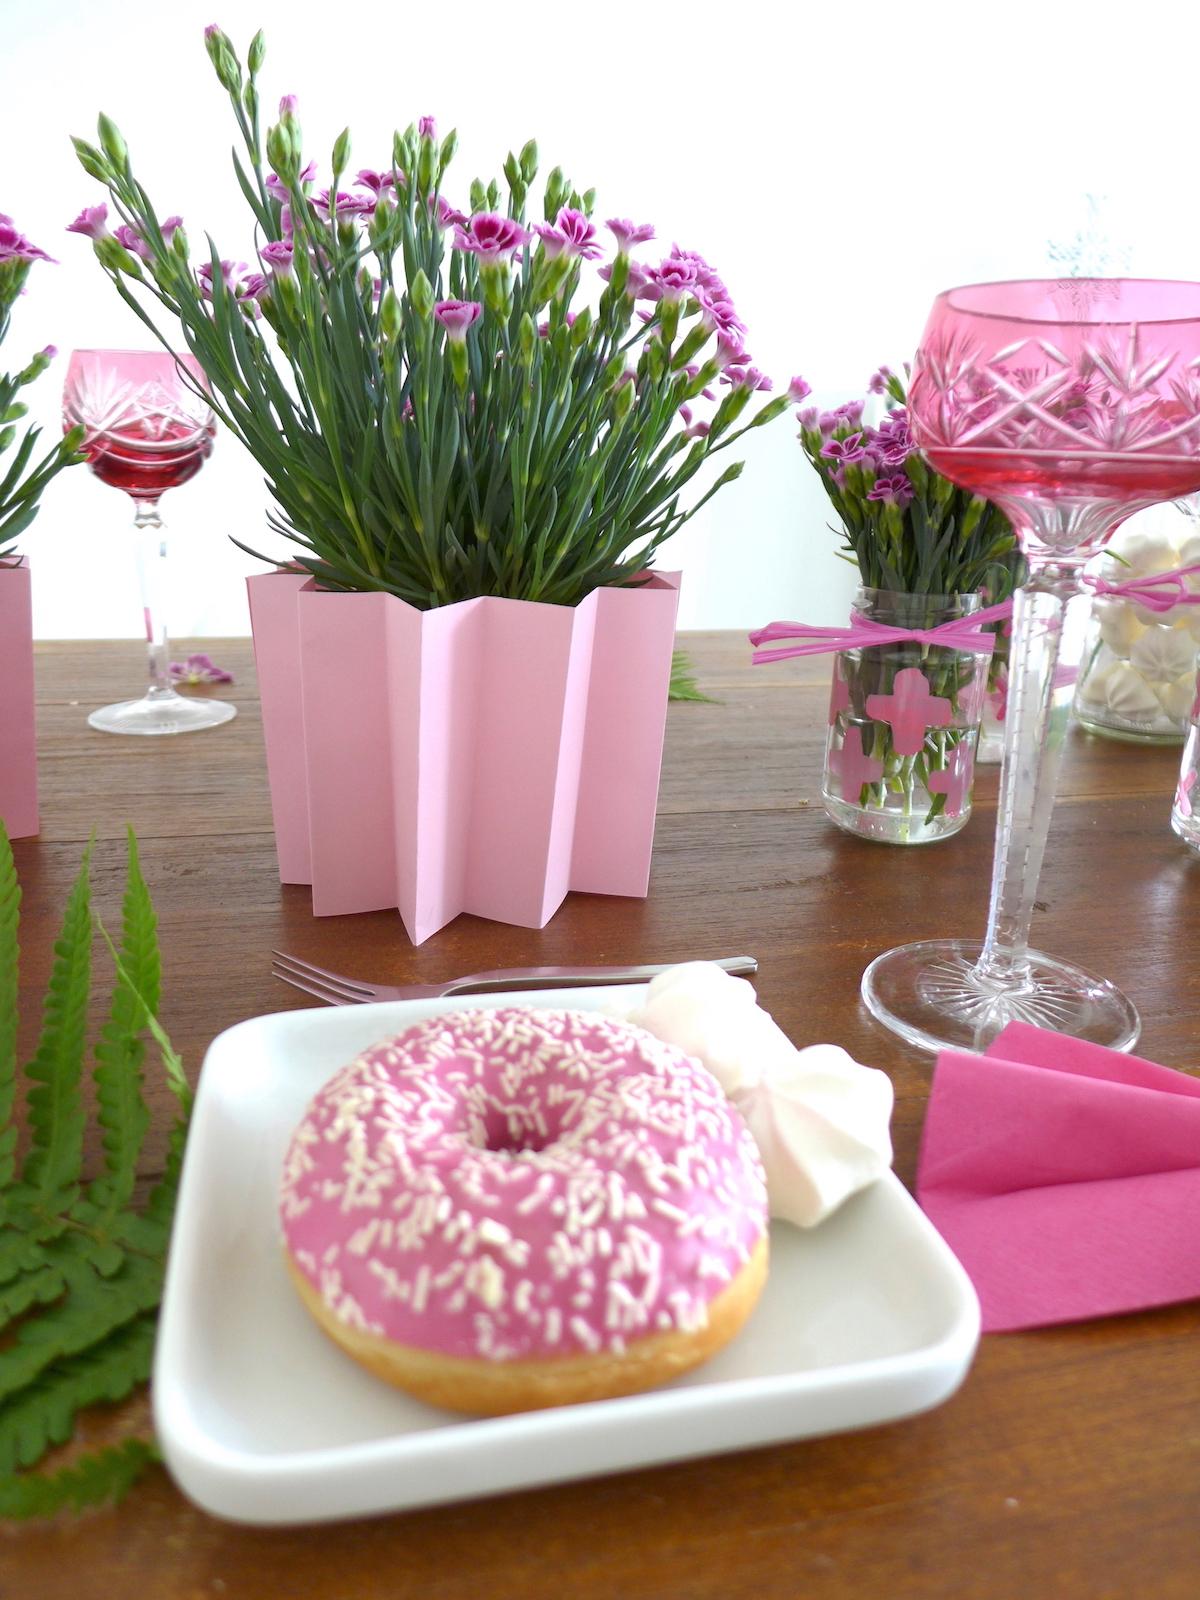 Pink power diy blumen tischdeko mit mininelken sophiagaleria for Tischdeko blumentopf